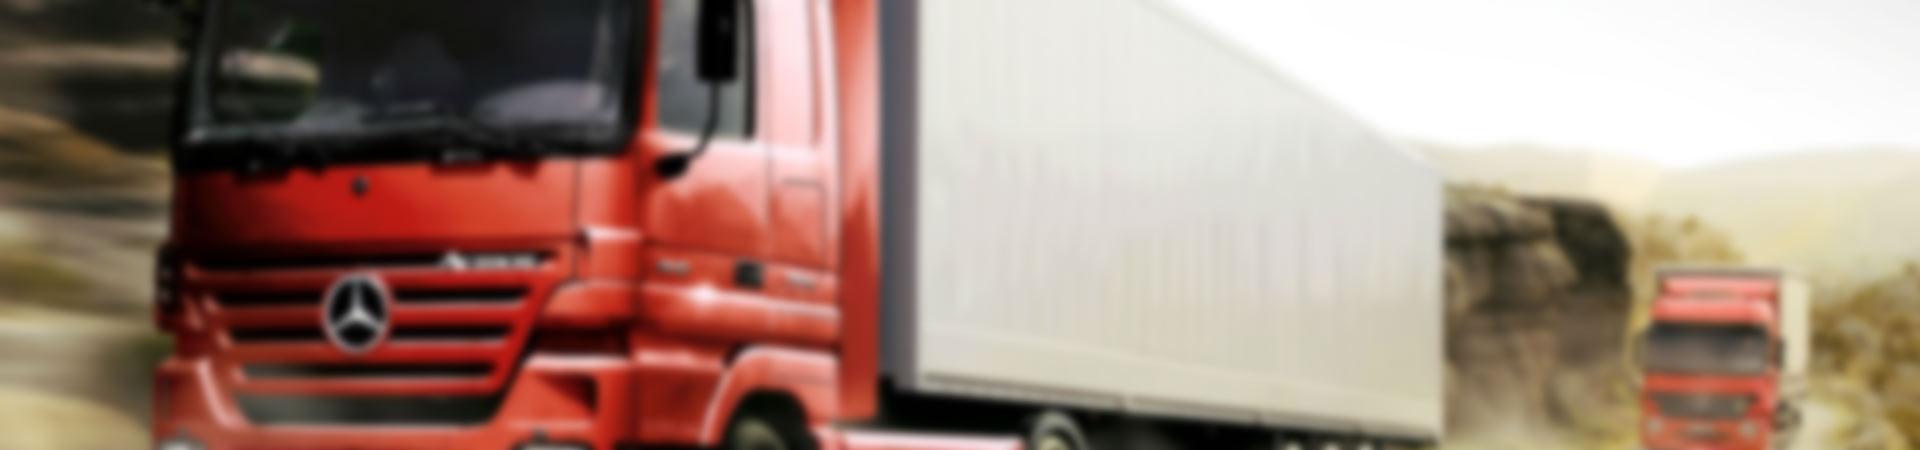 kamion-01